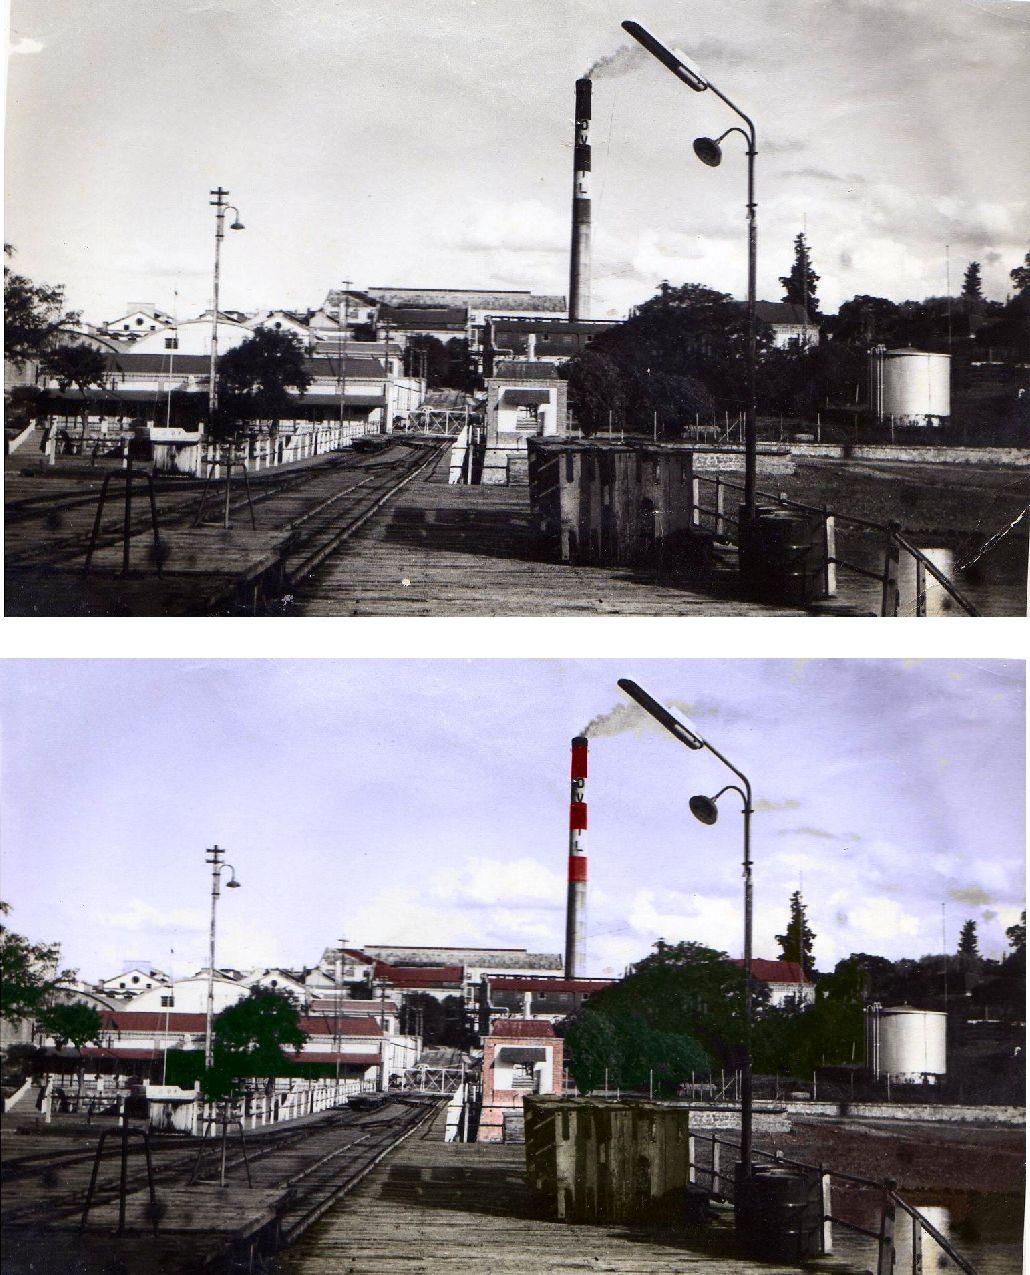 Dandole color a una vieja foto del Frigorifico Santa Elena